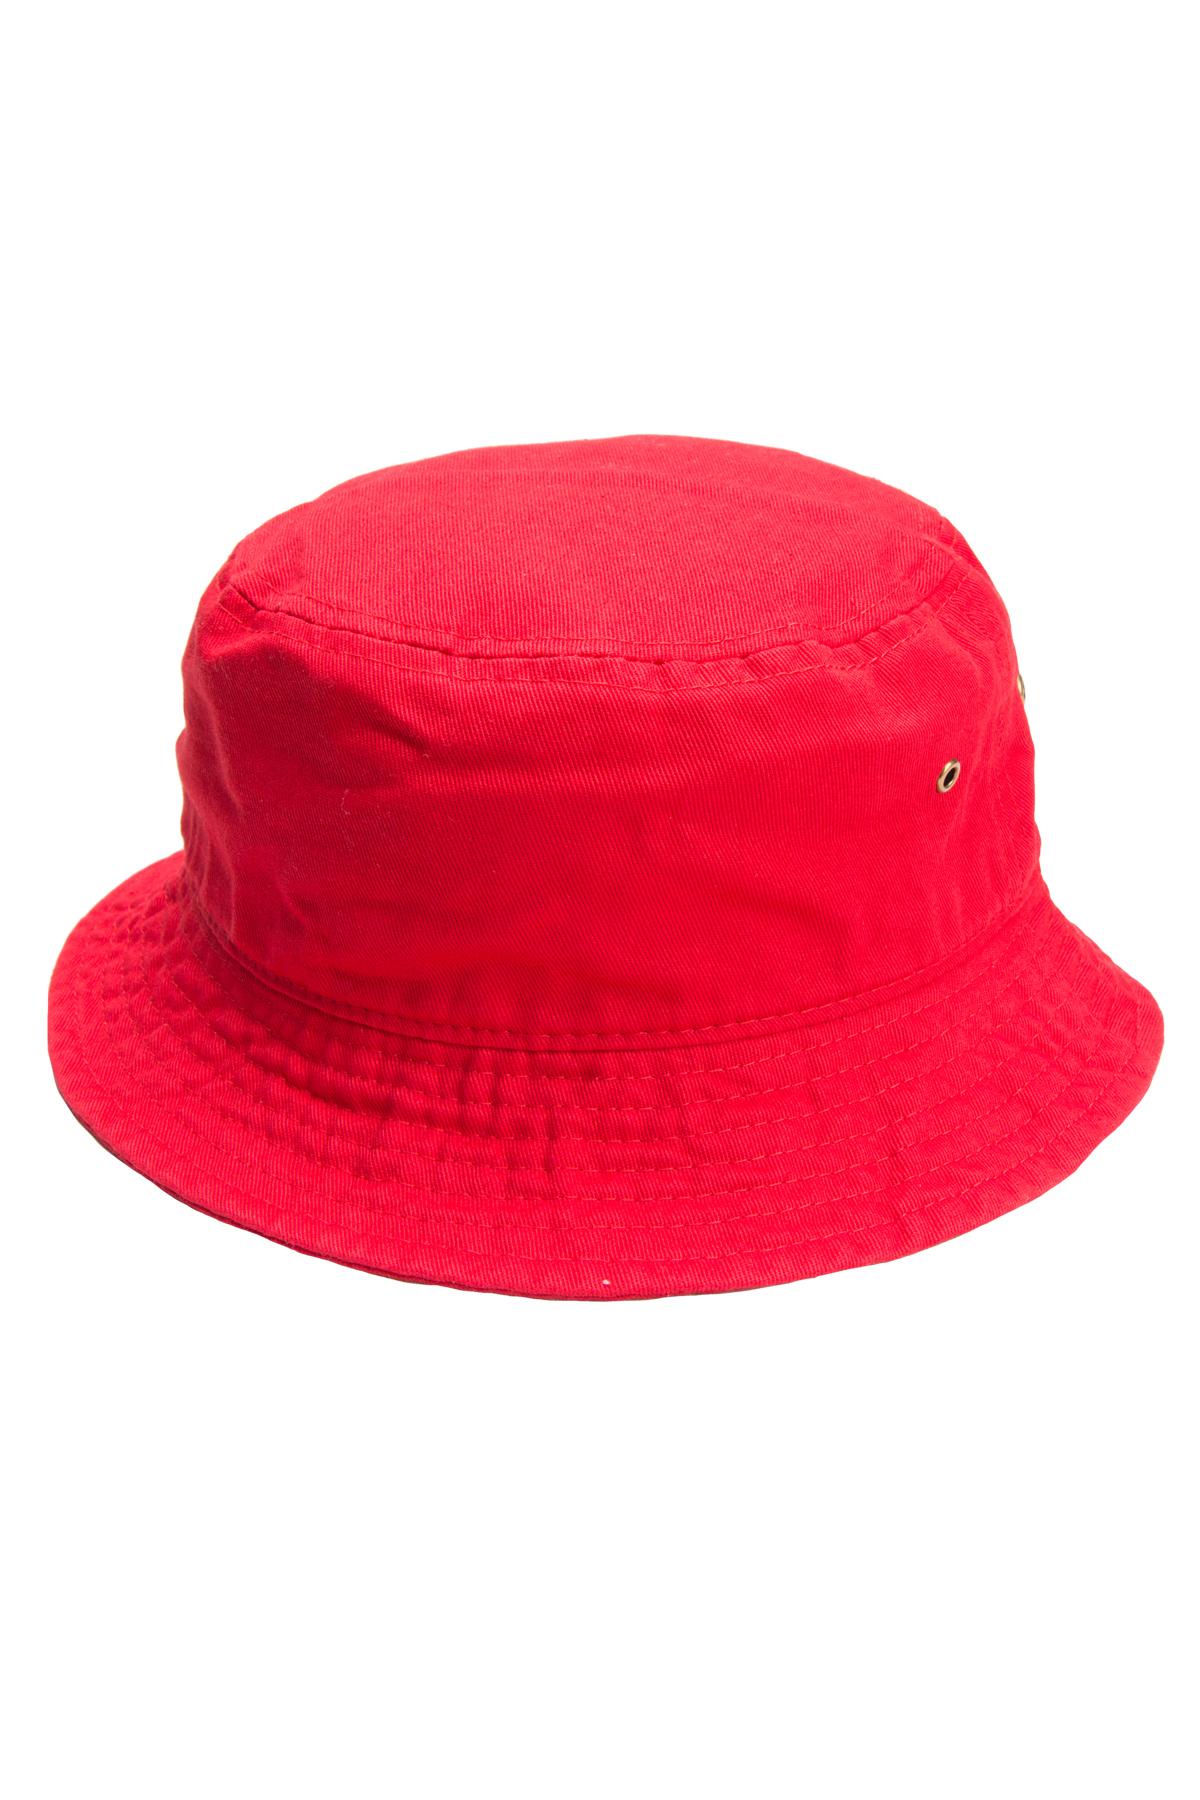 Red Bucket Hat.